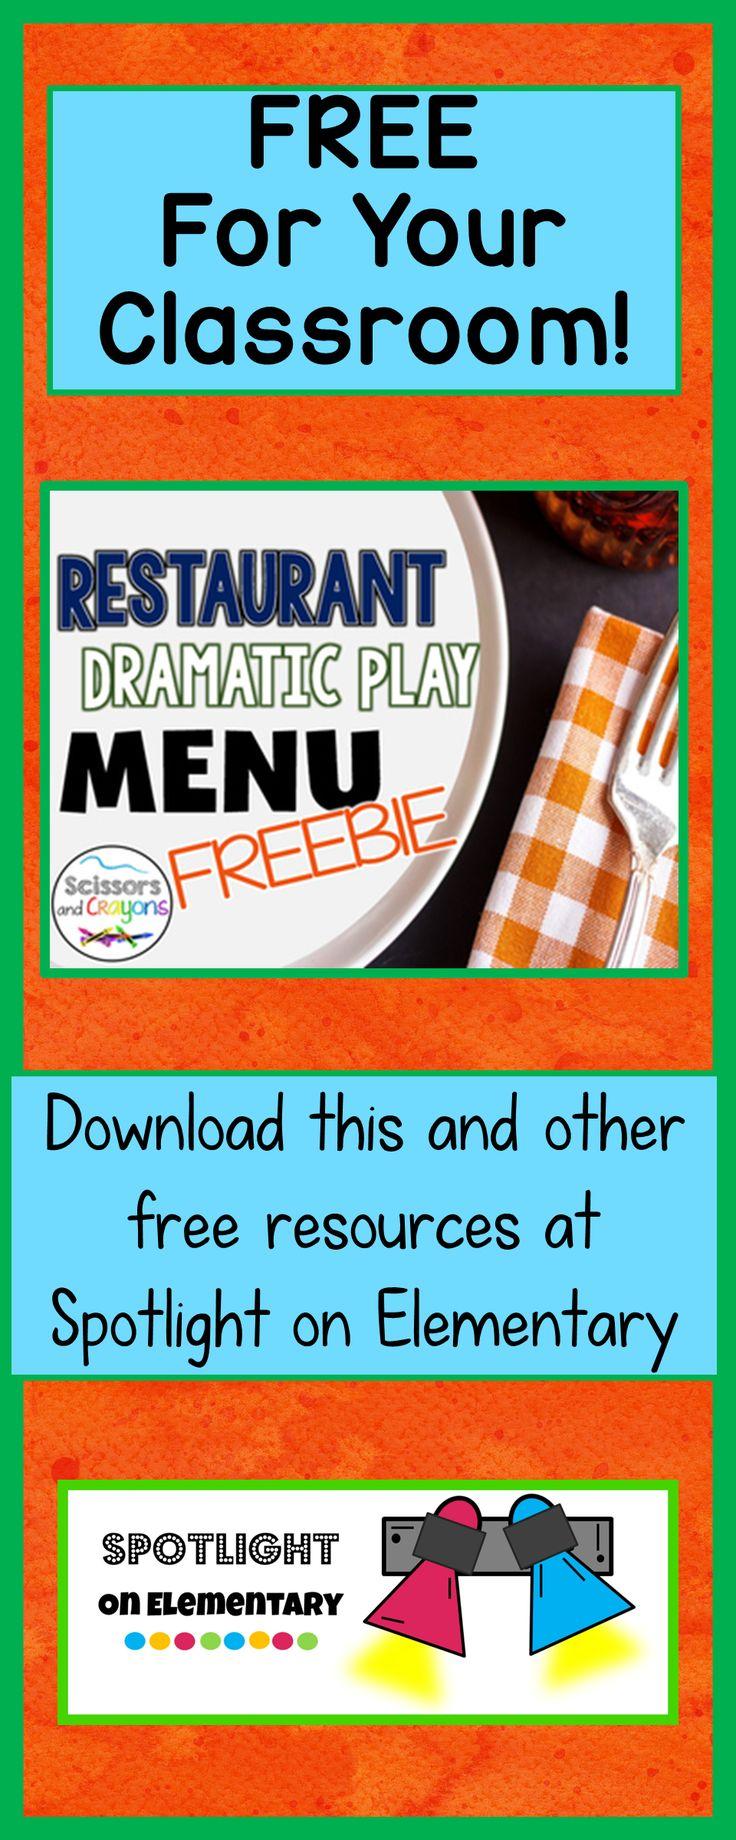 31 best FREEBIES! images on Pinterest | Classroom organization ...